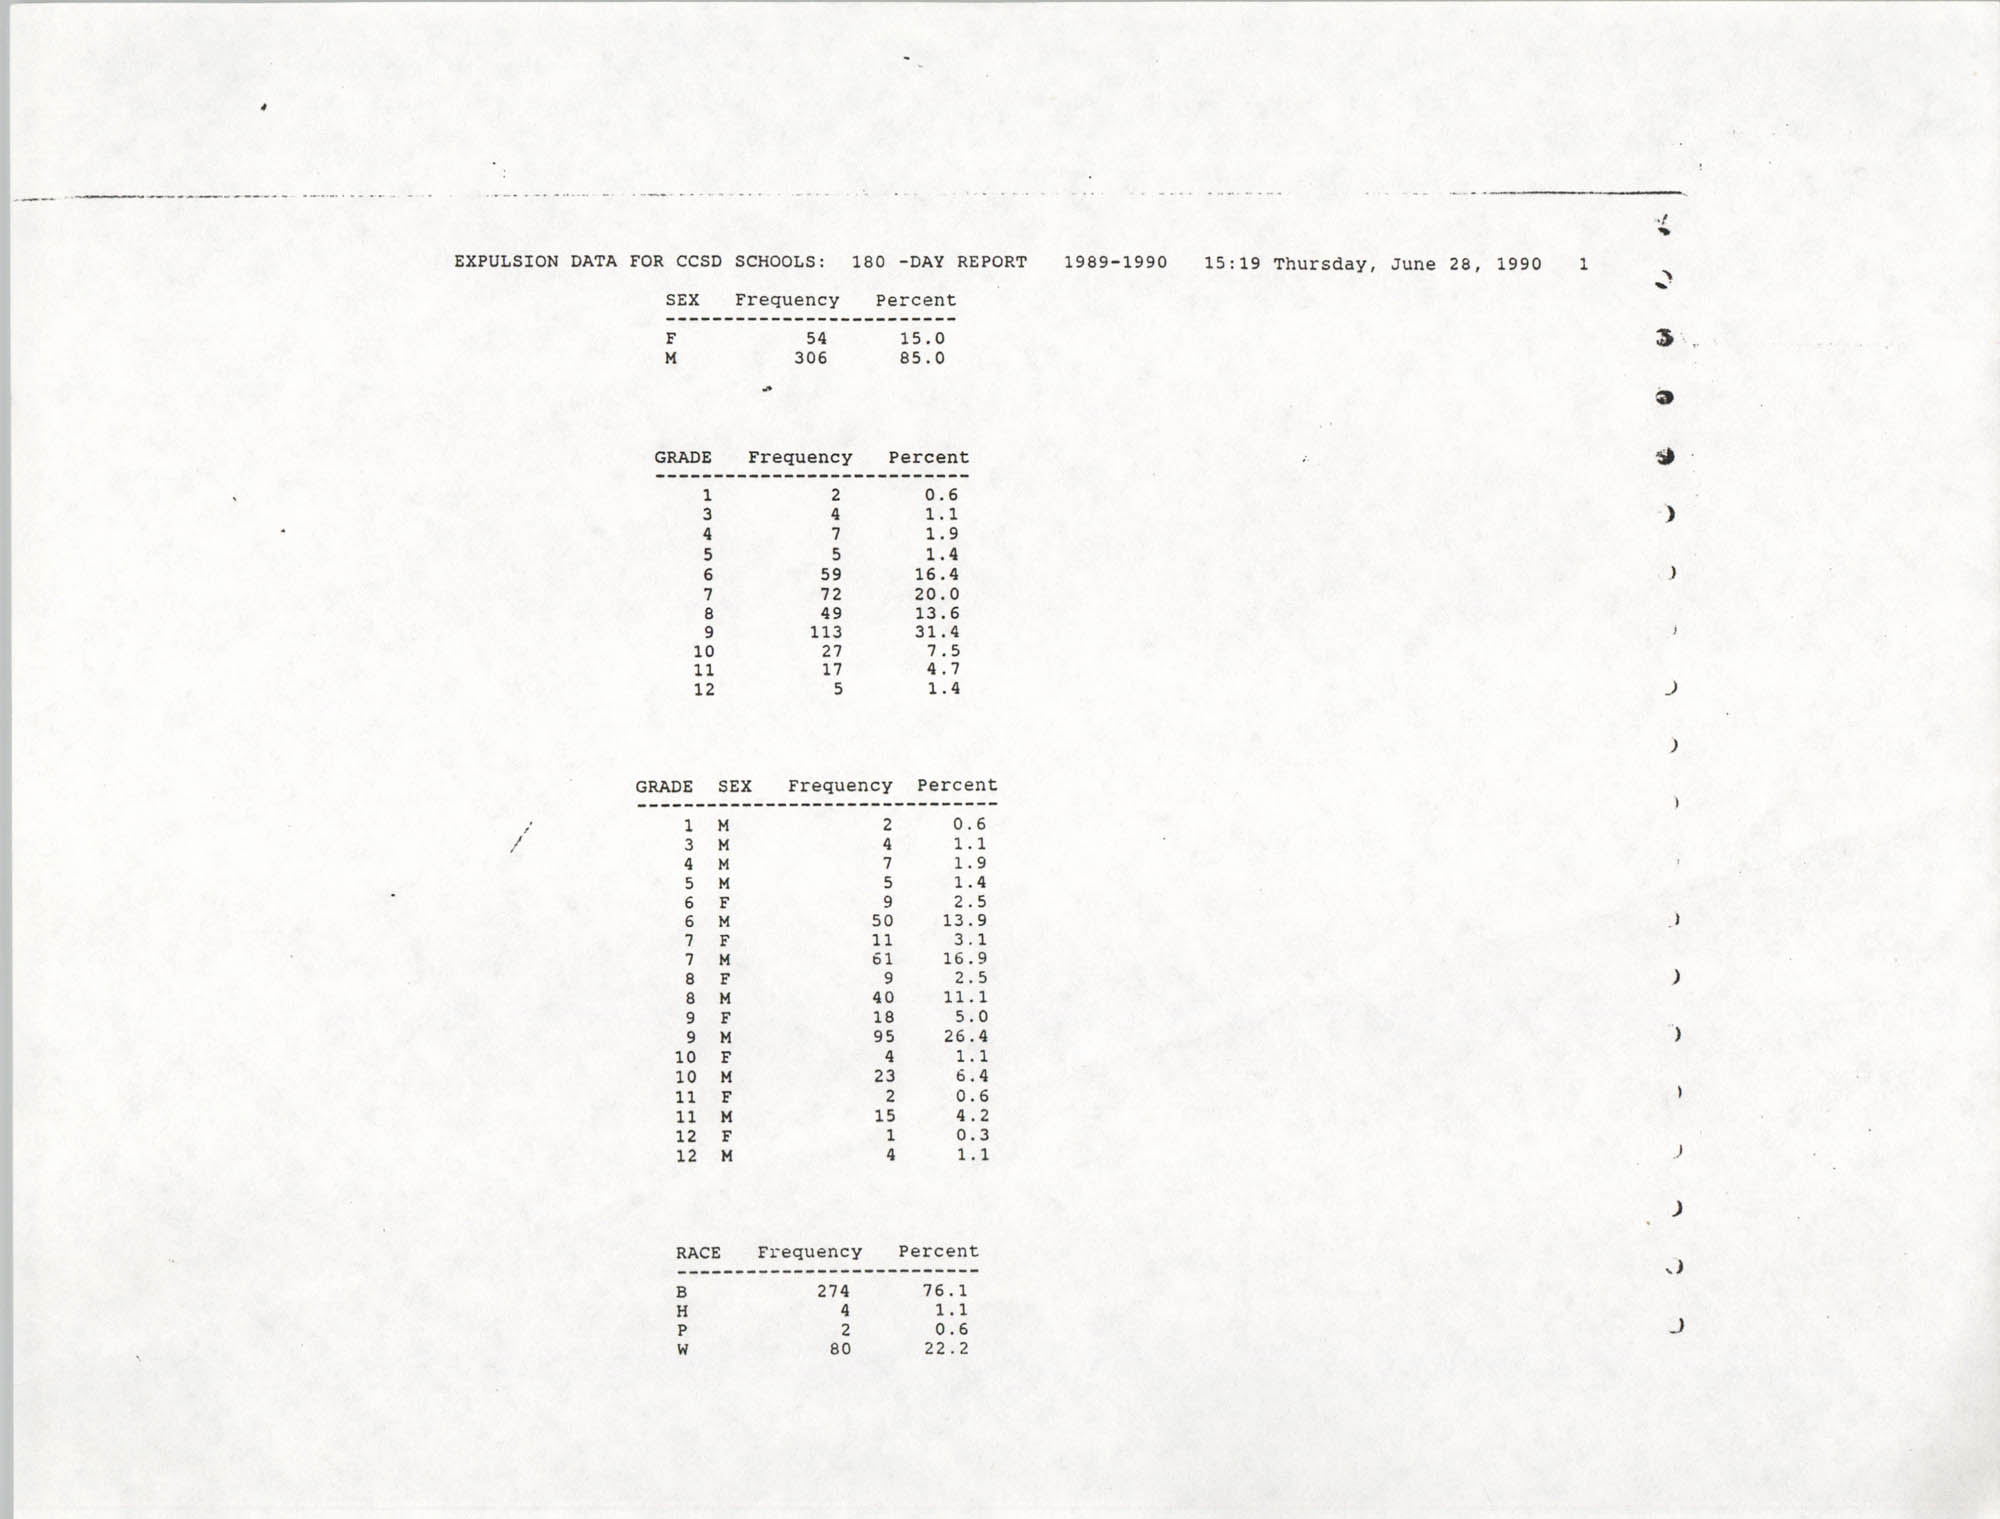 Data for Charleston County School District Schools, 1989-1990, Expulsion Data, Page 1